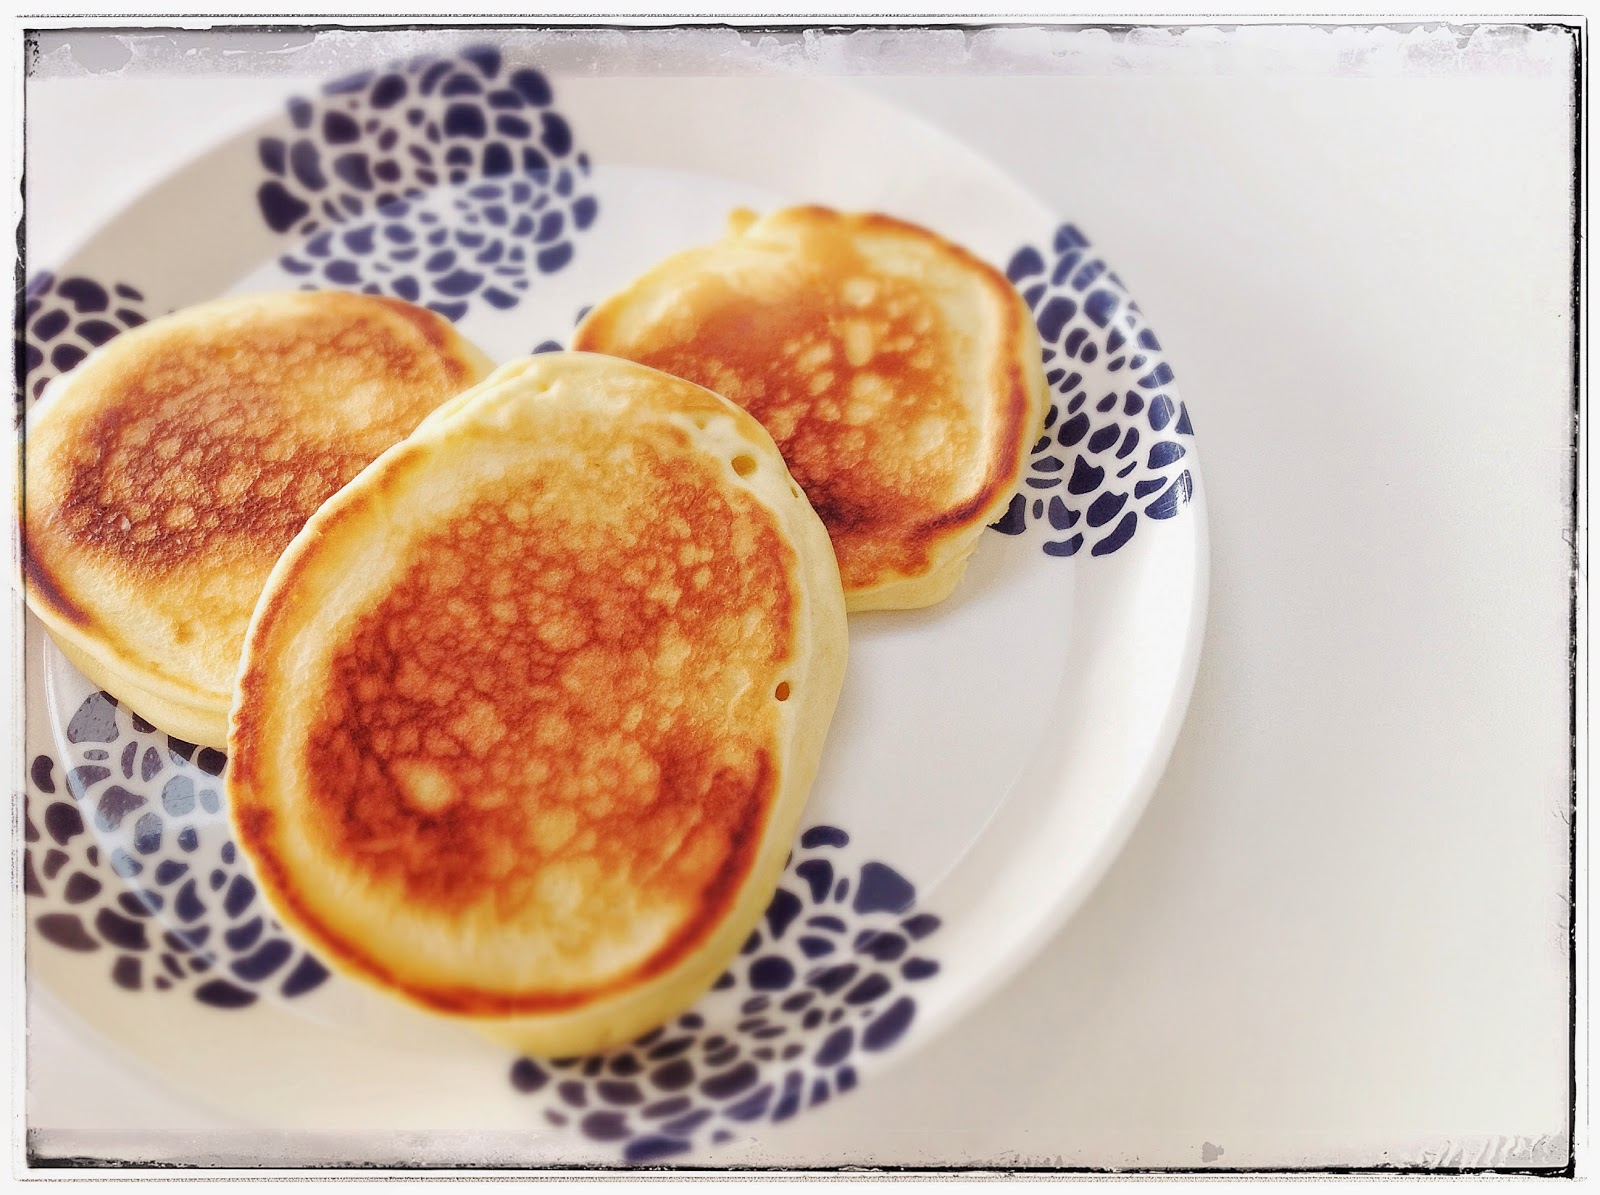 hugh-fearnley-whittingstalls-drop-scones-scotch-pancakes